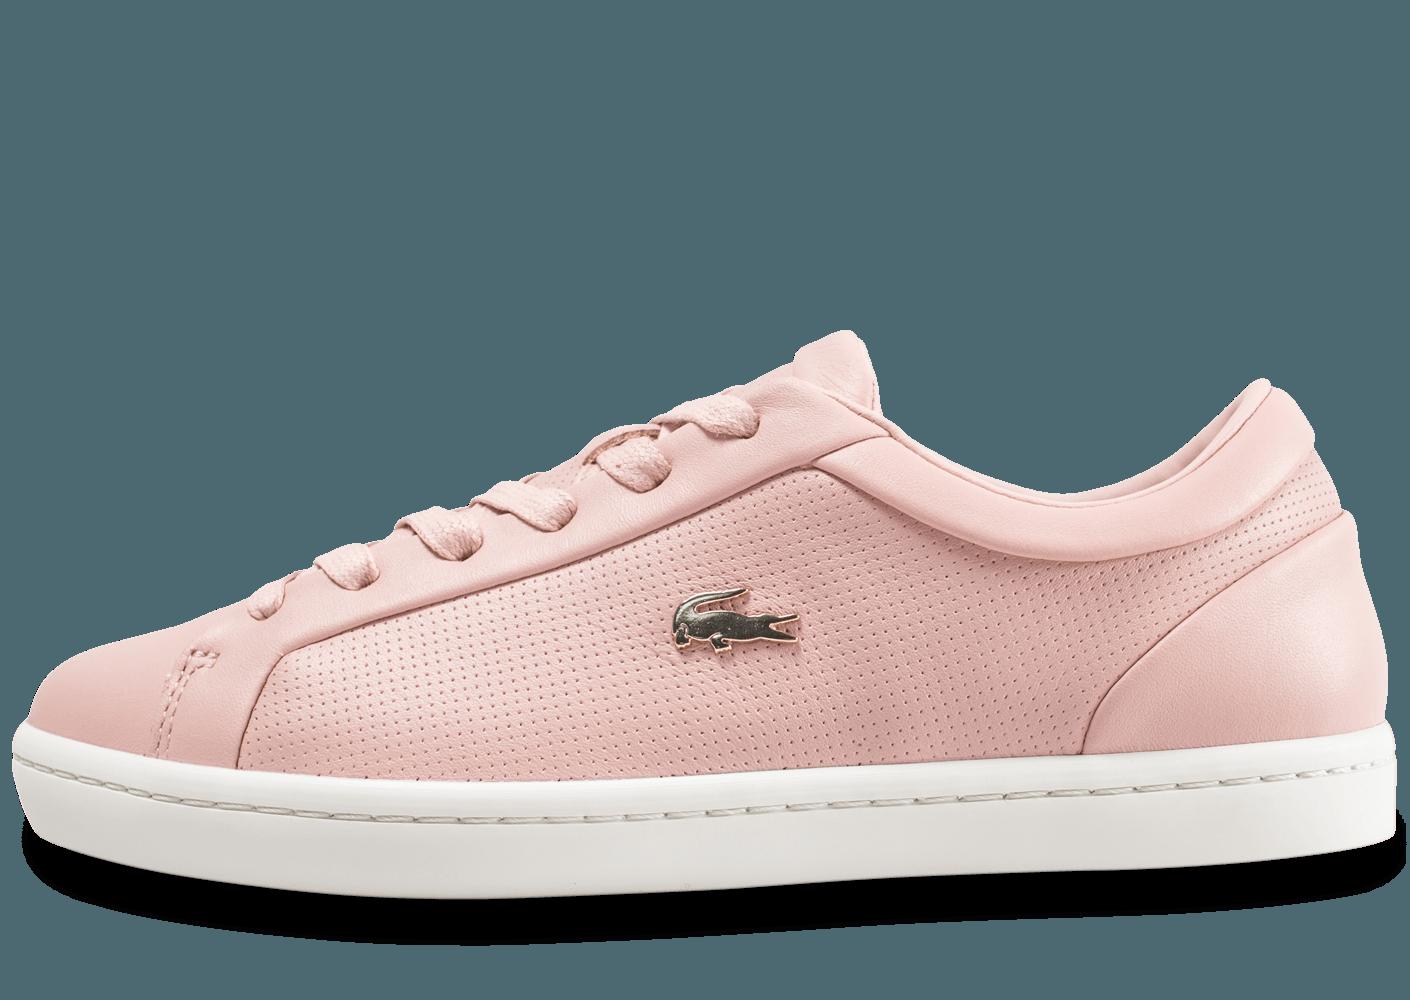 Lacoste Rose Chaussure switchyard Ruwfr Femme kZTOPXiu